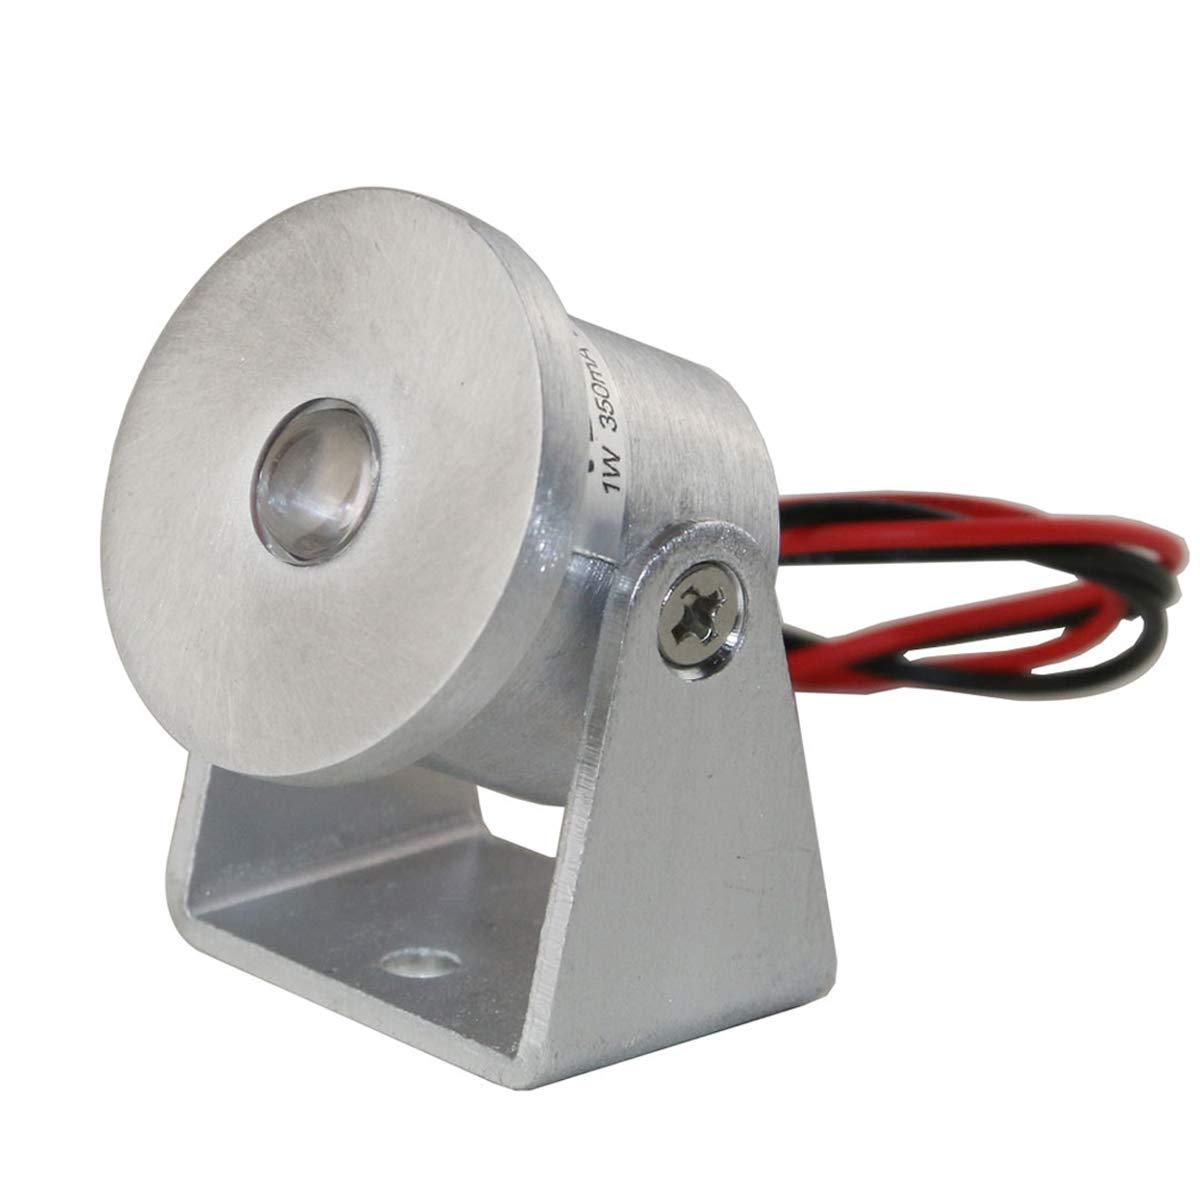 VBLED® 1W Mini Aufbaustrahler Rotier- & Schwenkbar 200° 80lm Dimmbar 3000K 12V